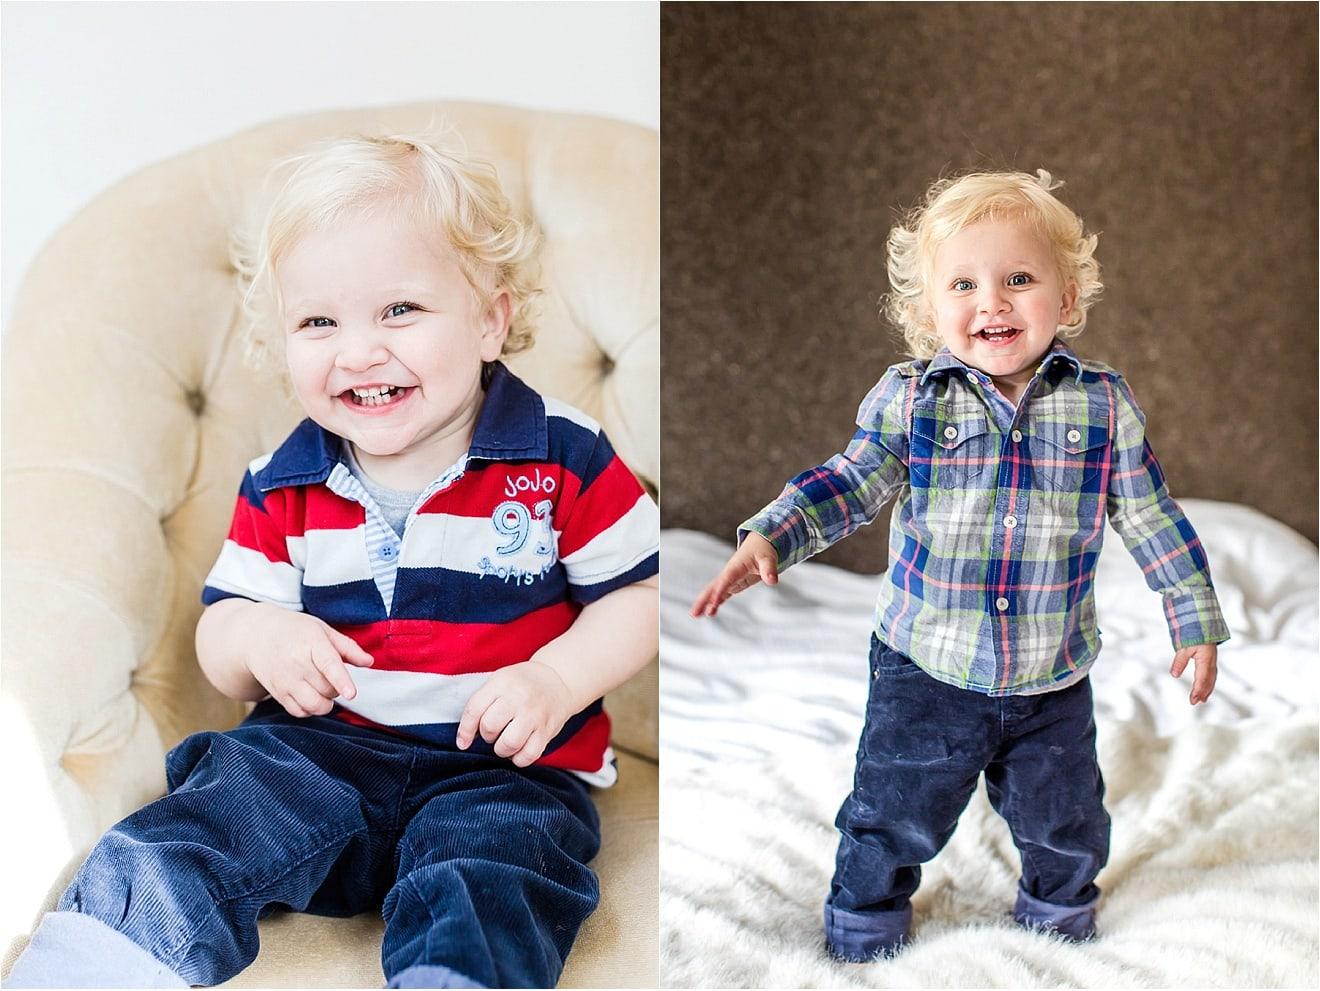 Eddie-Judd-Family-Portrait-Photography023